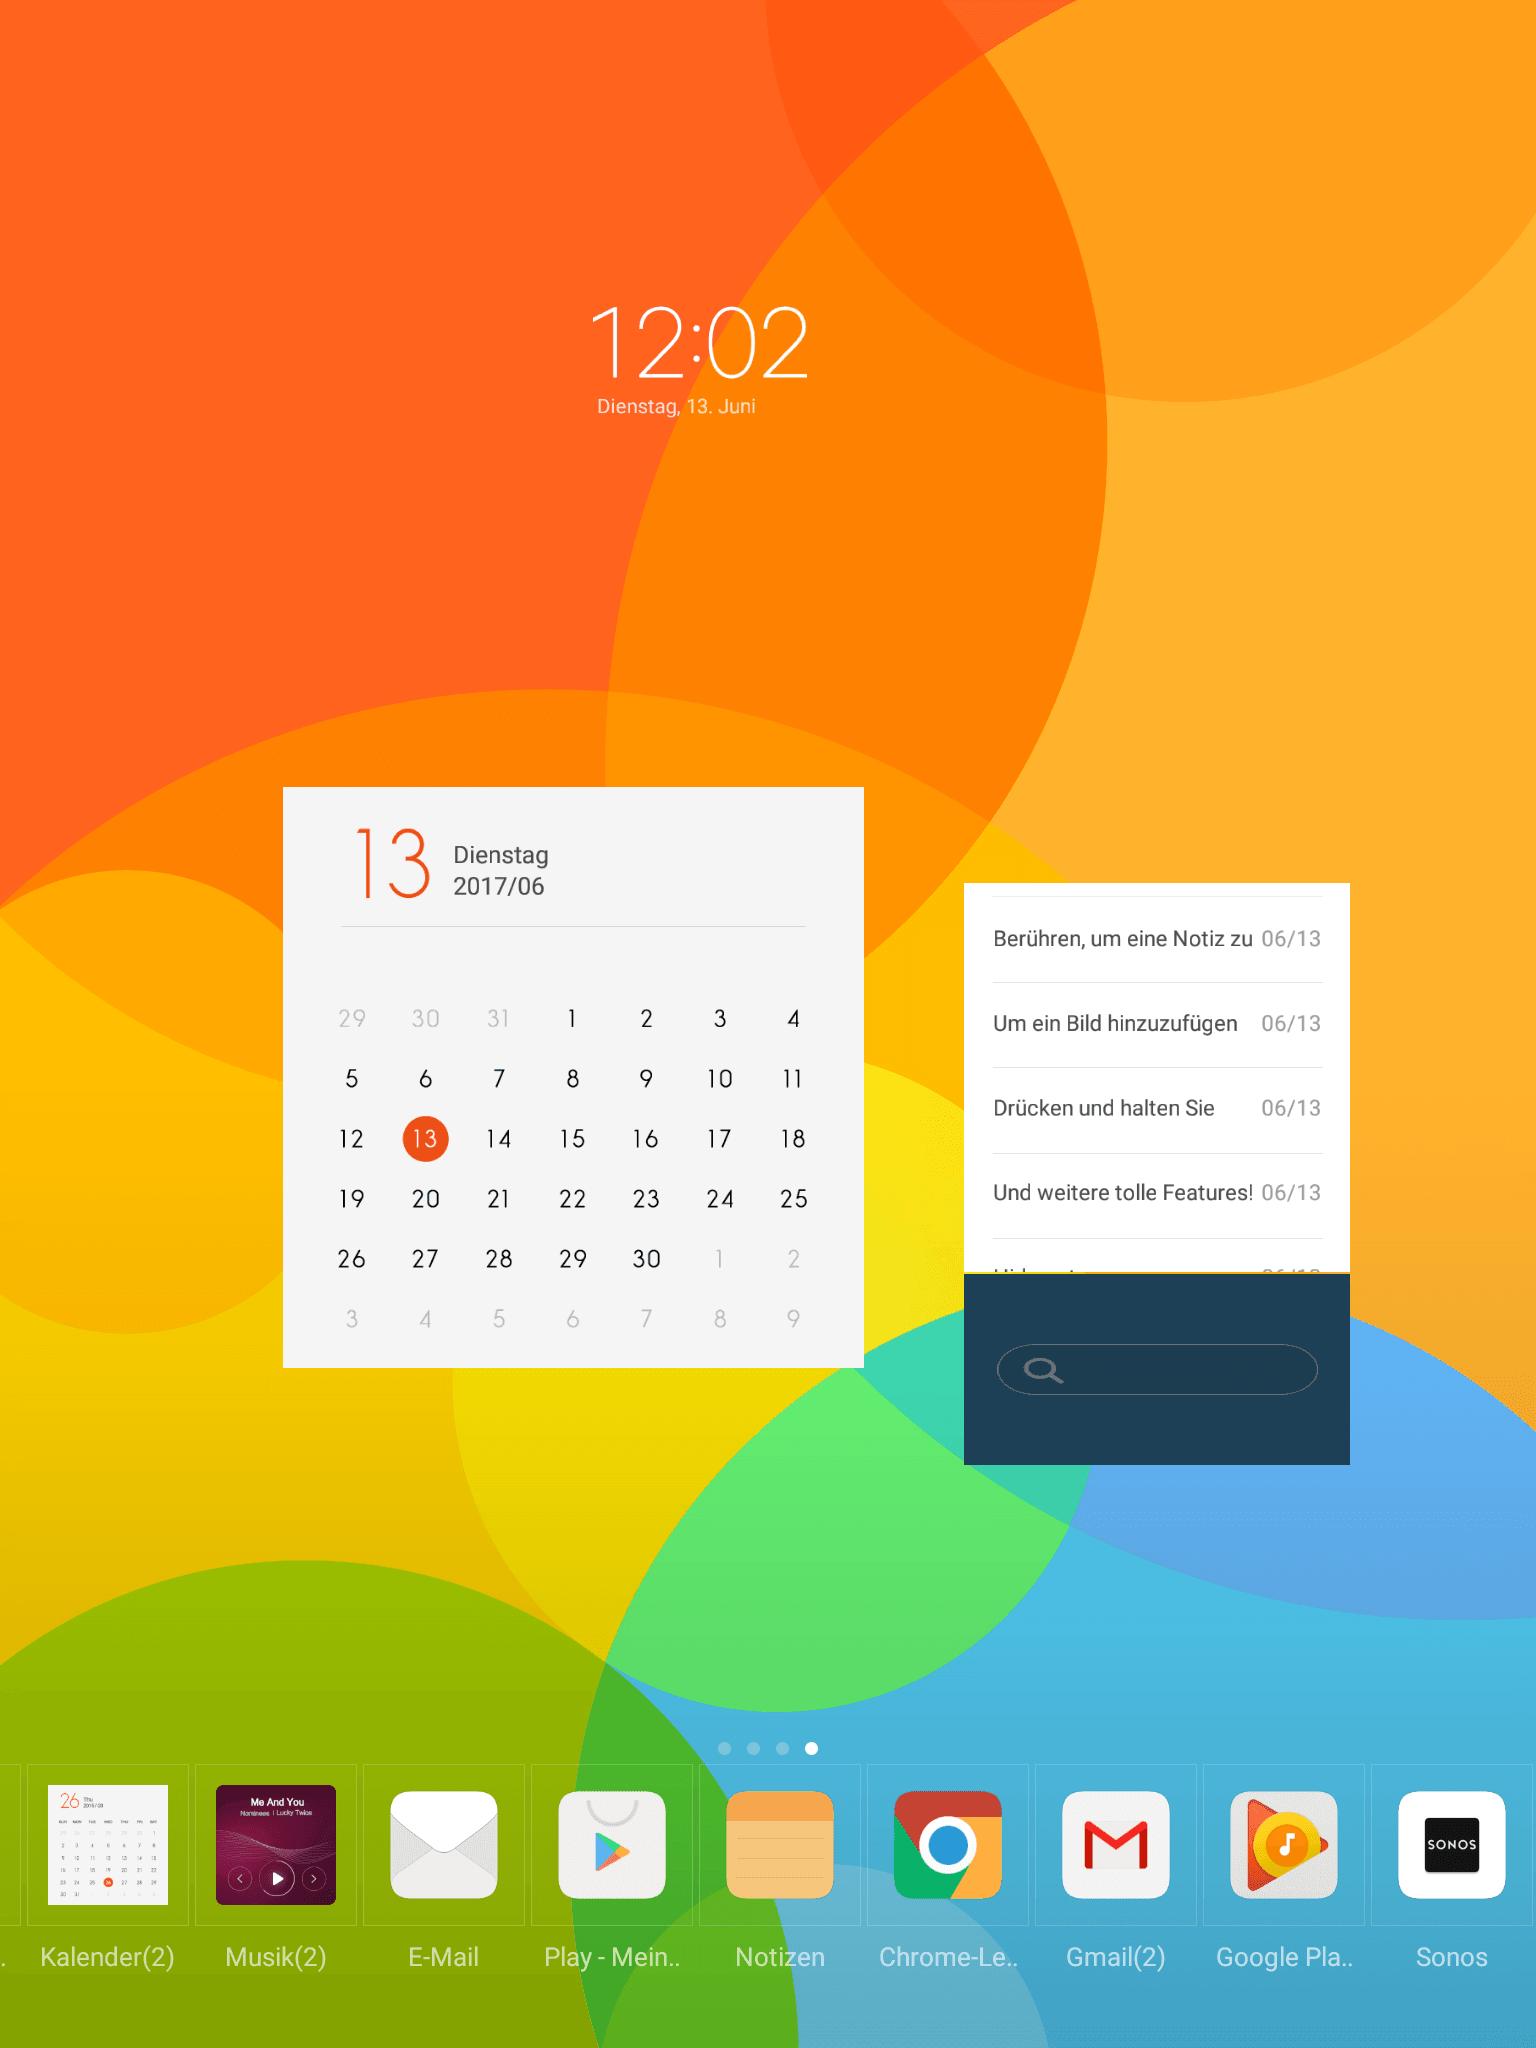 Xiaomi Mi Pad 3 Test – das ideale Tablet für Couch-Potatoes 23 techboys.de • smarte News, auf den Punkt! Xiaomi Mi Pad 3 Test – das ideale Tablet für Couch-Potatoes